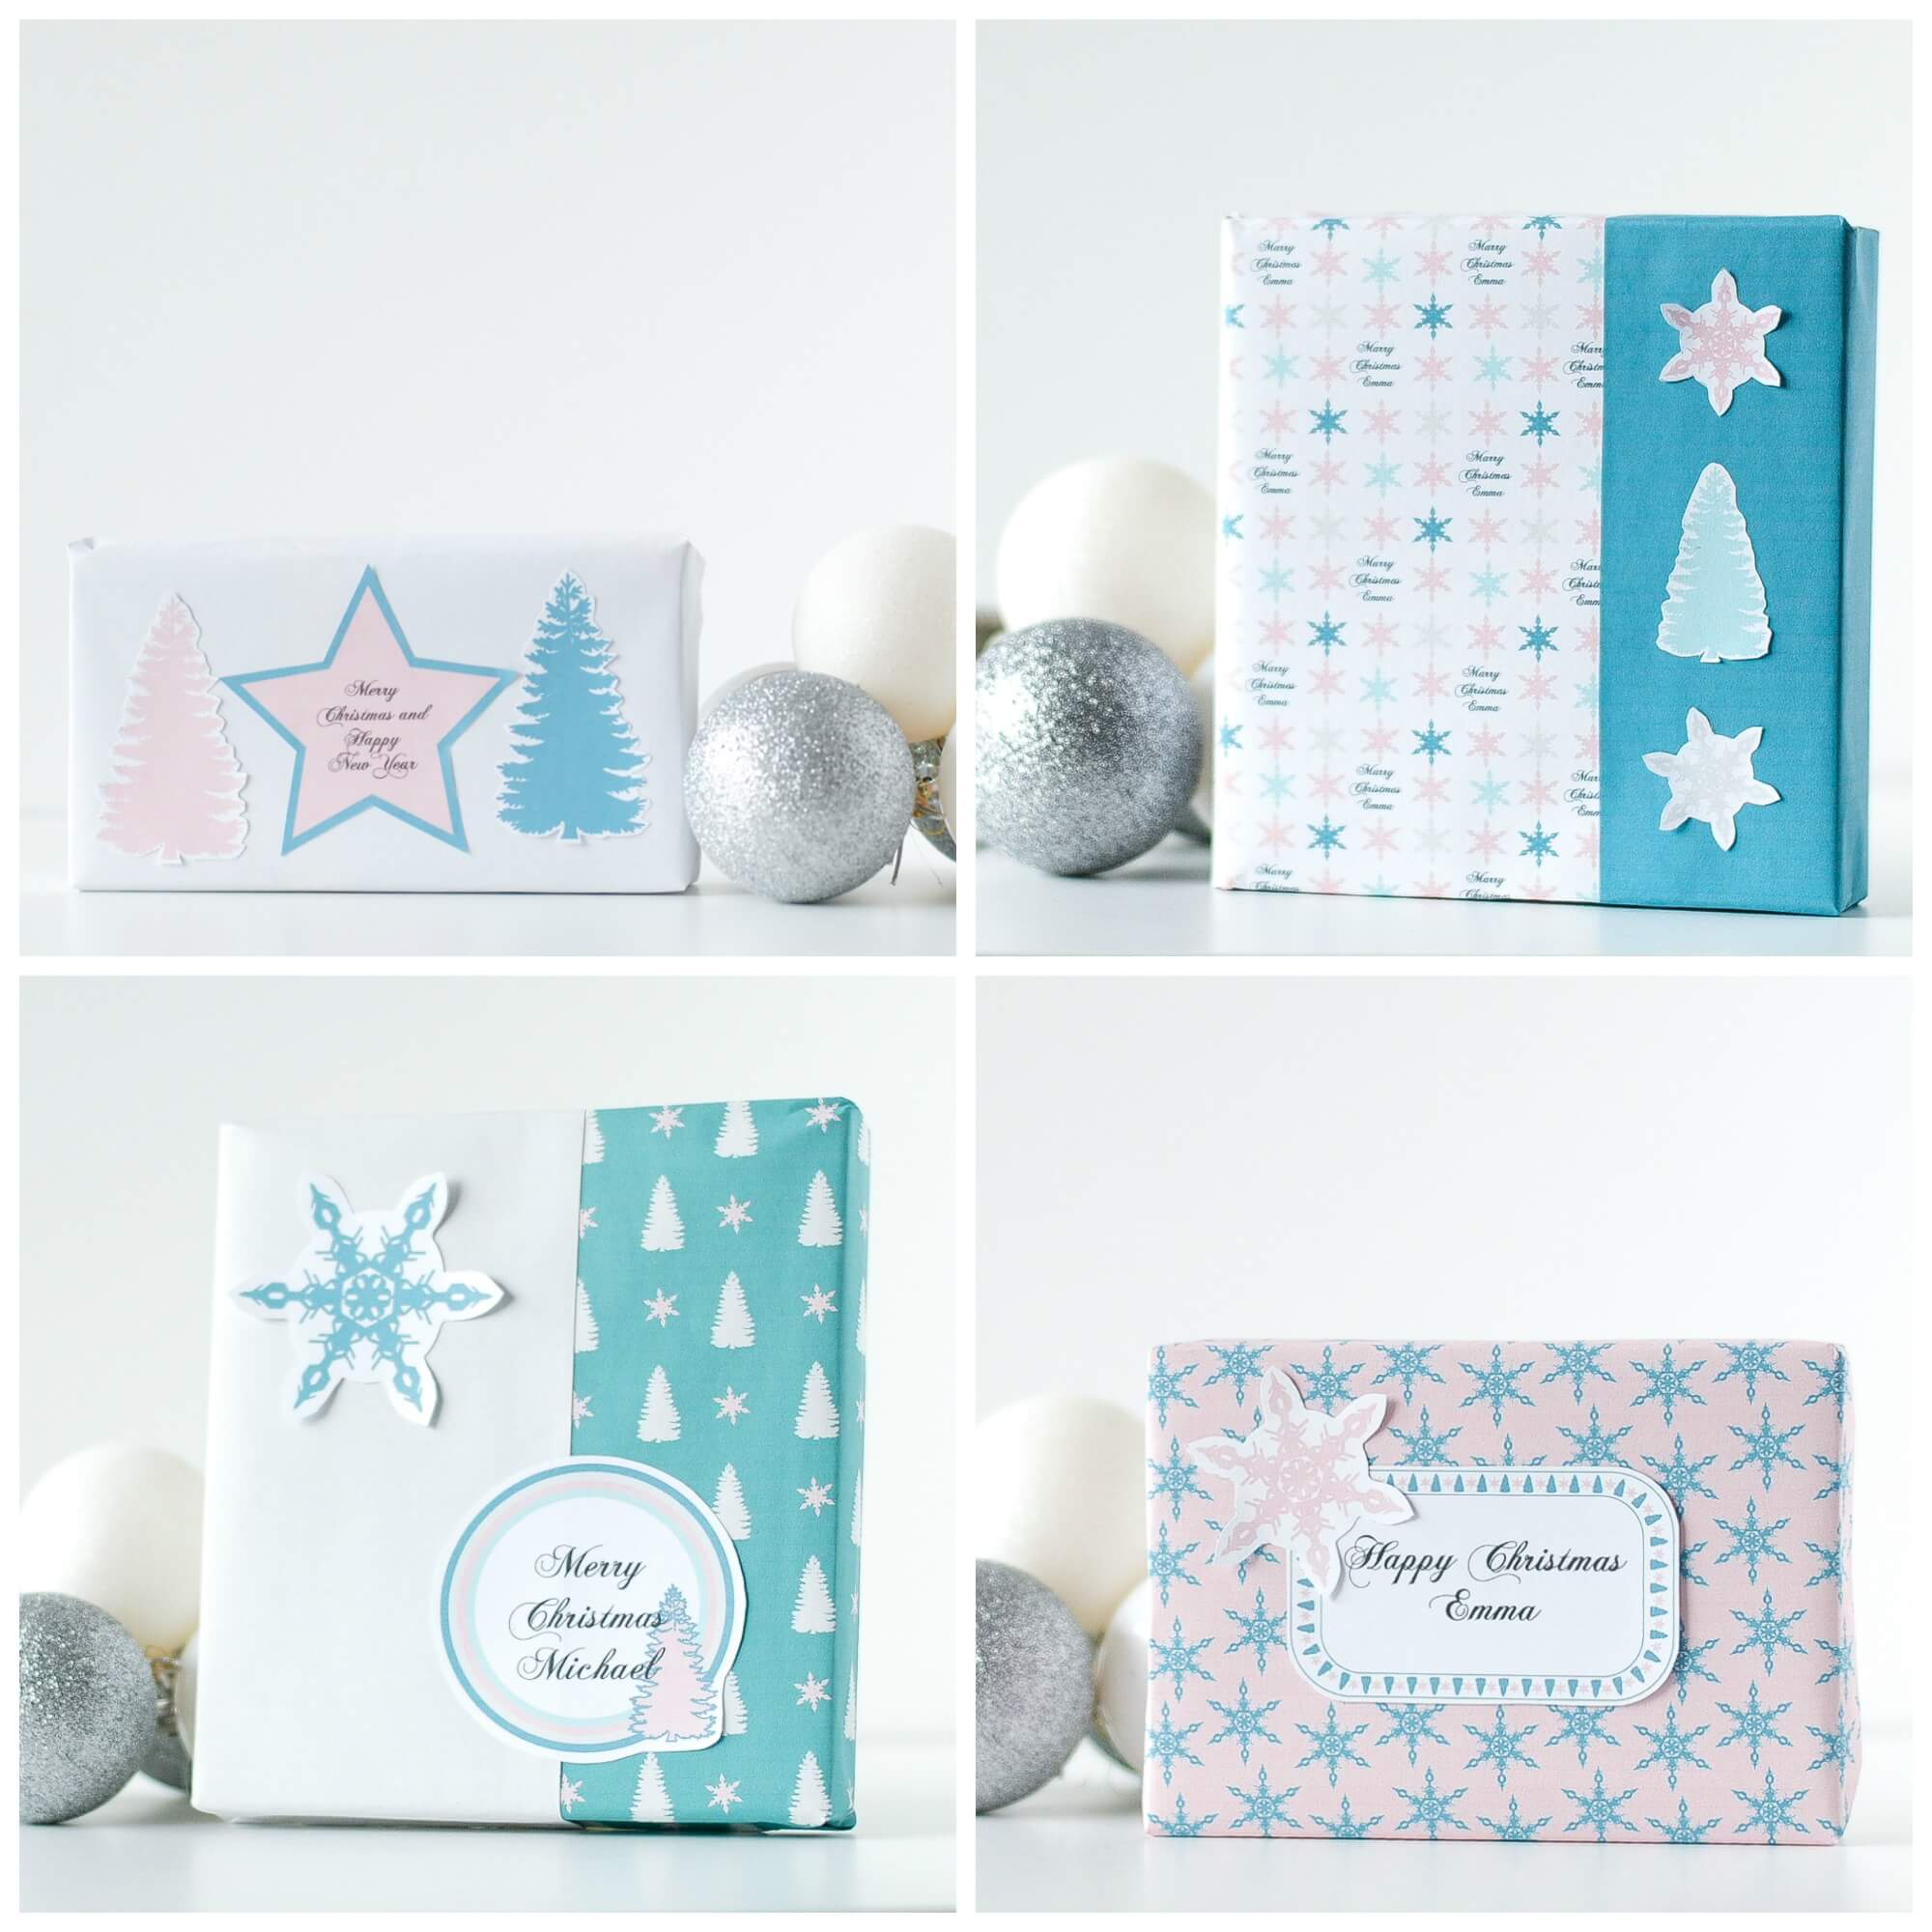 graphic regarding Free Printable Christmas Paper named No cost Printable Xmas Wrapping Paper: Quick Reward Wrap